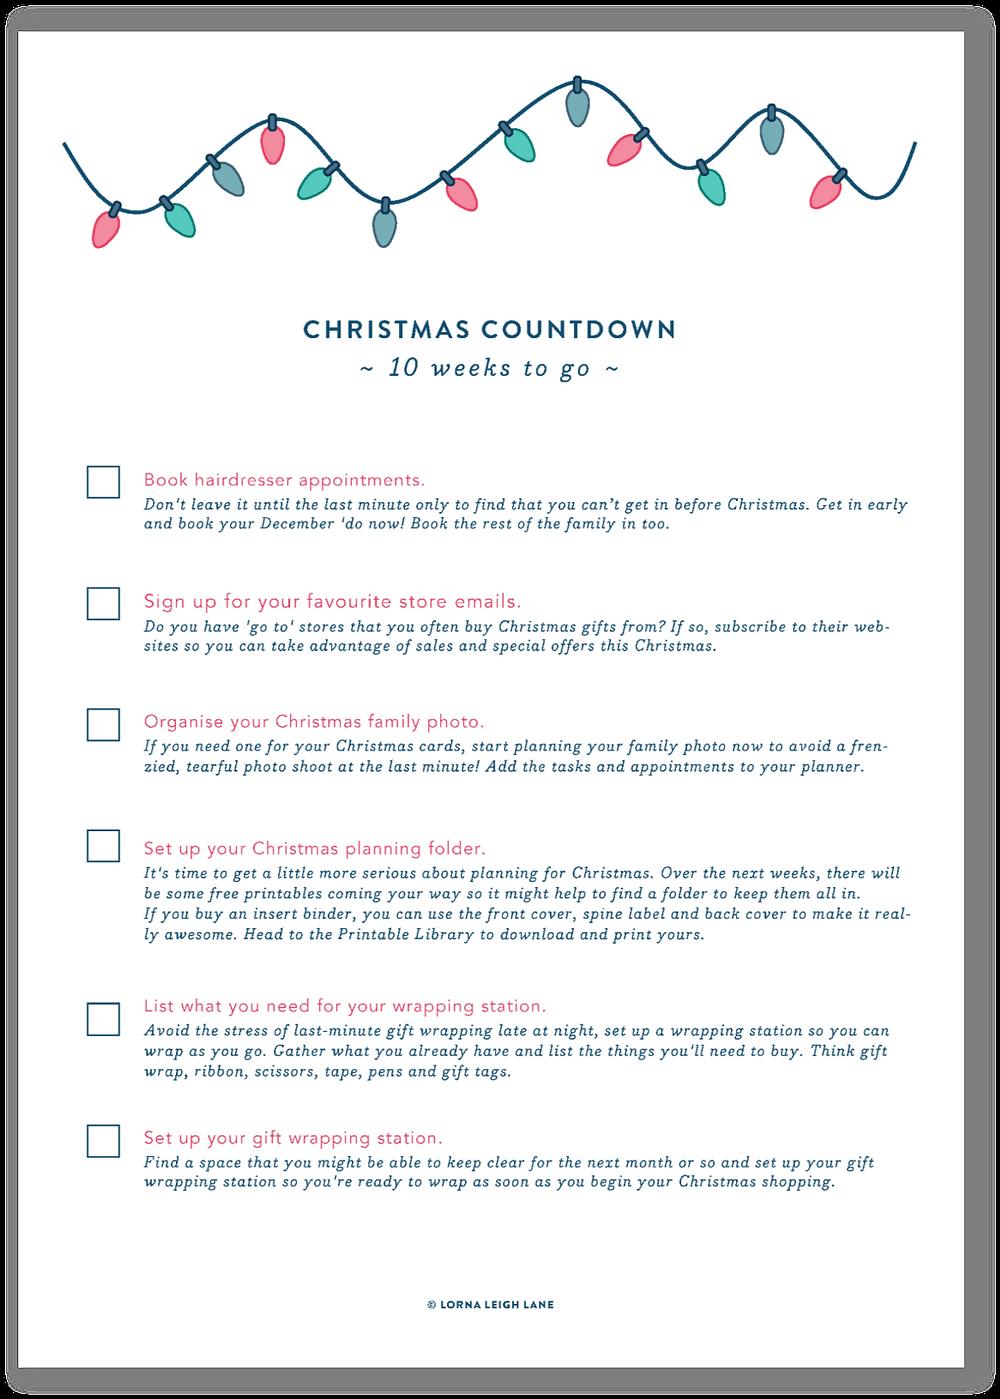 Christmas Countdown - 10 weeks to go